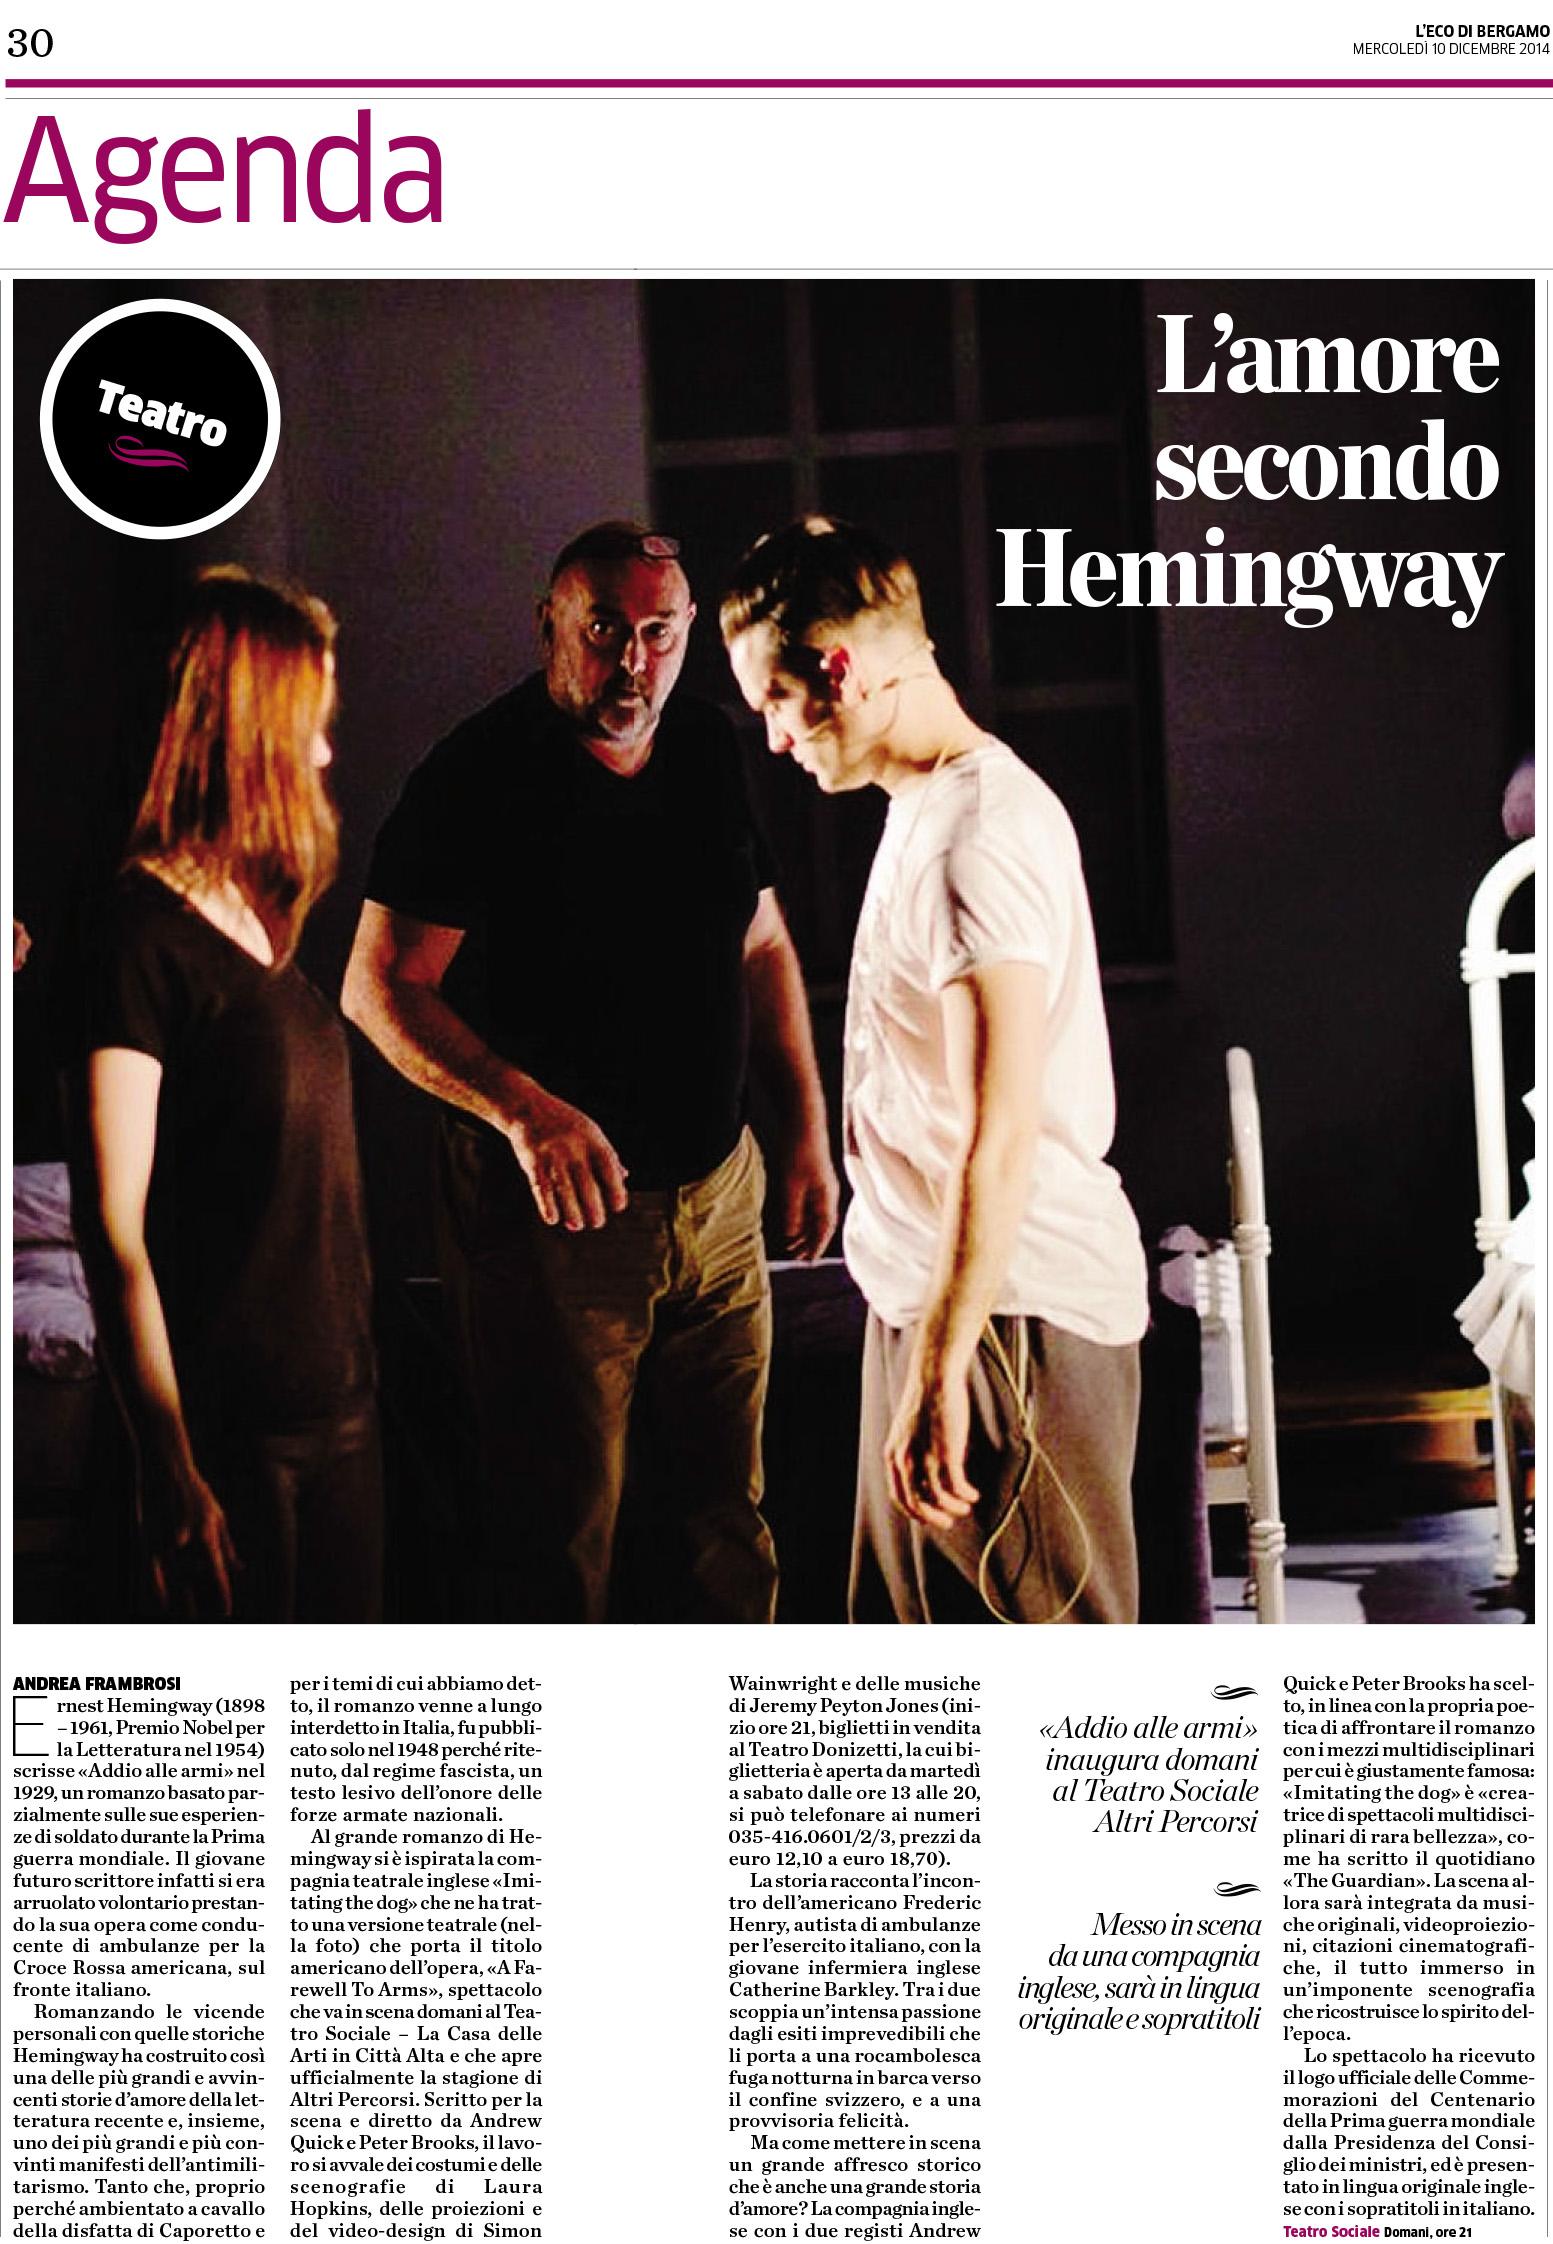 2014.12.10 L'amore secondo Hemingway - Eco di Bergamo